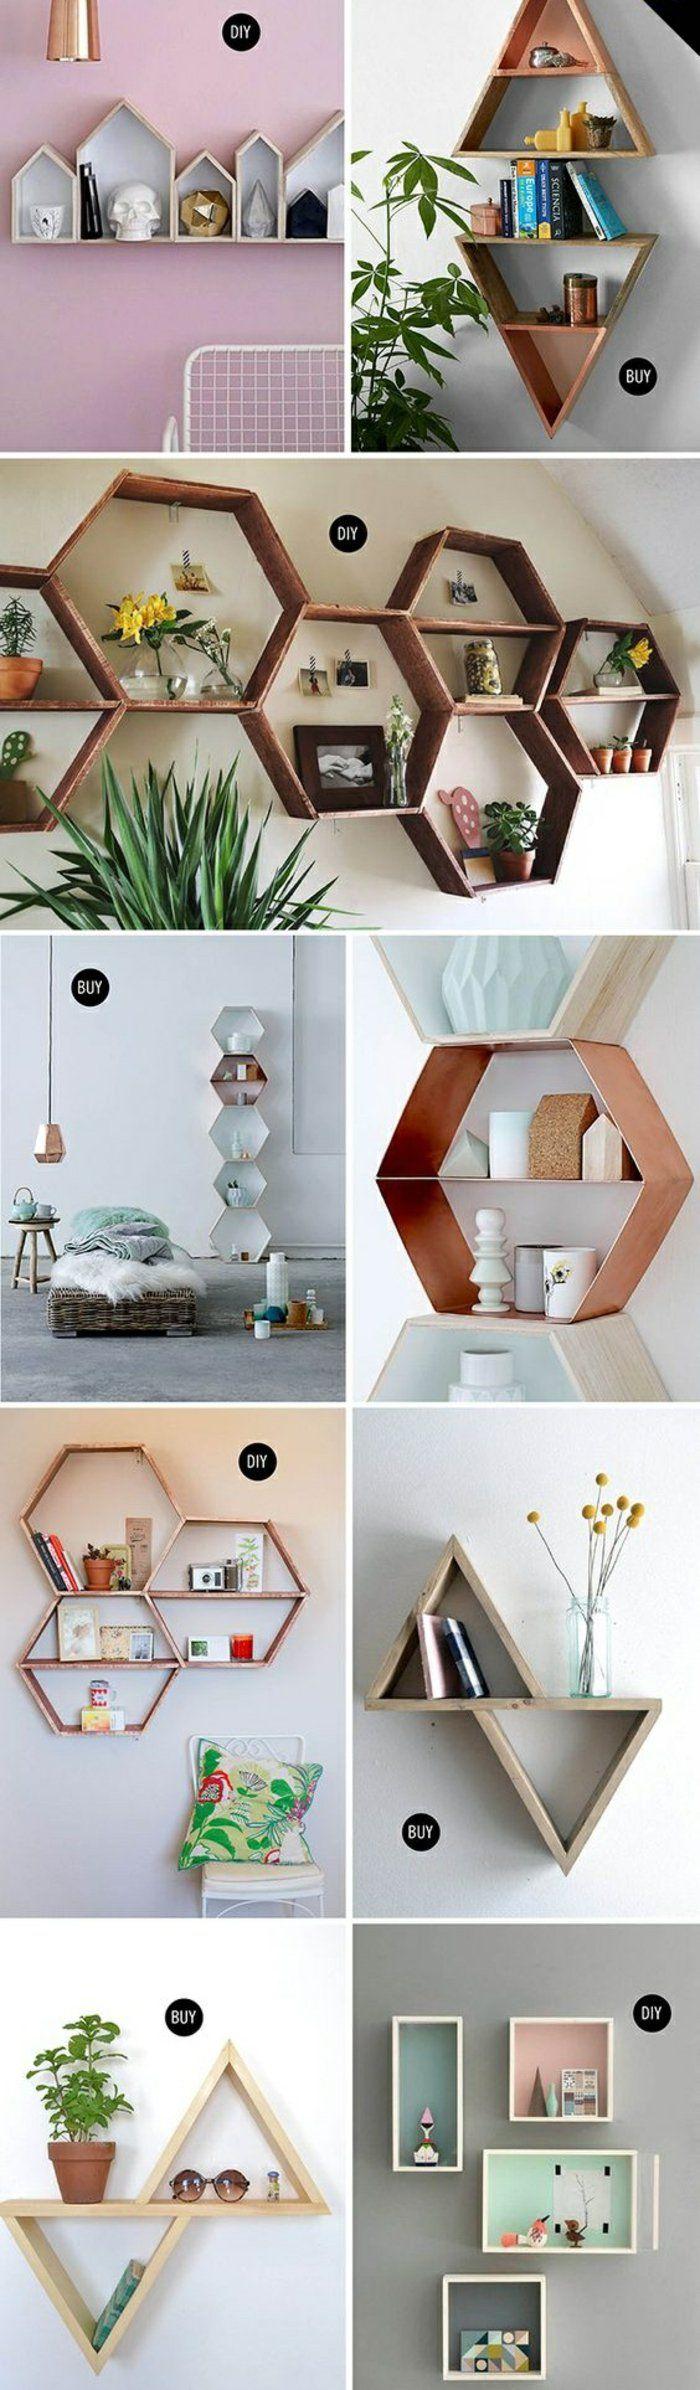 13 wandregal selber bauen interessante ideen regale aus holz dekorationen kreative wandgestaltung